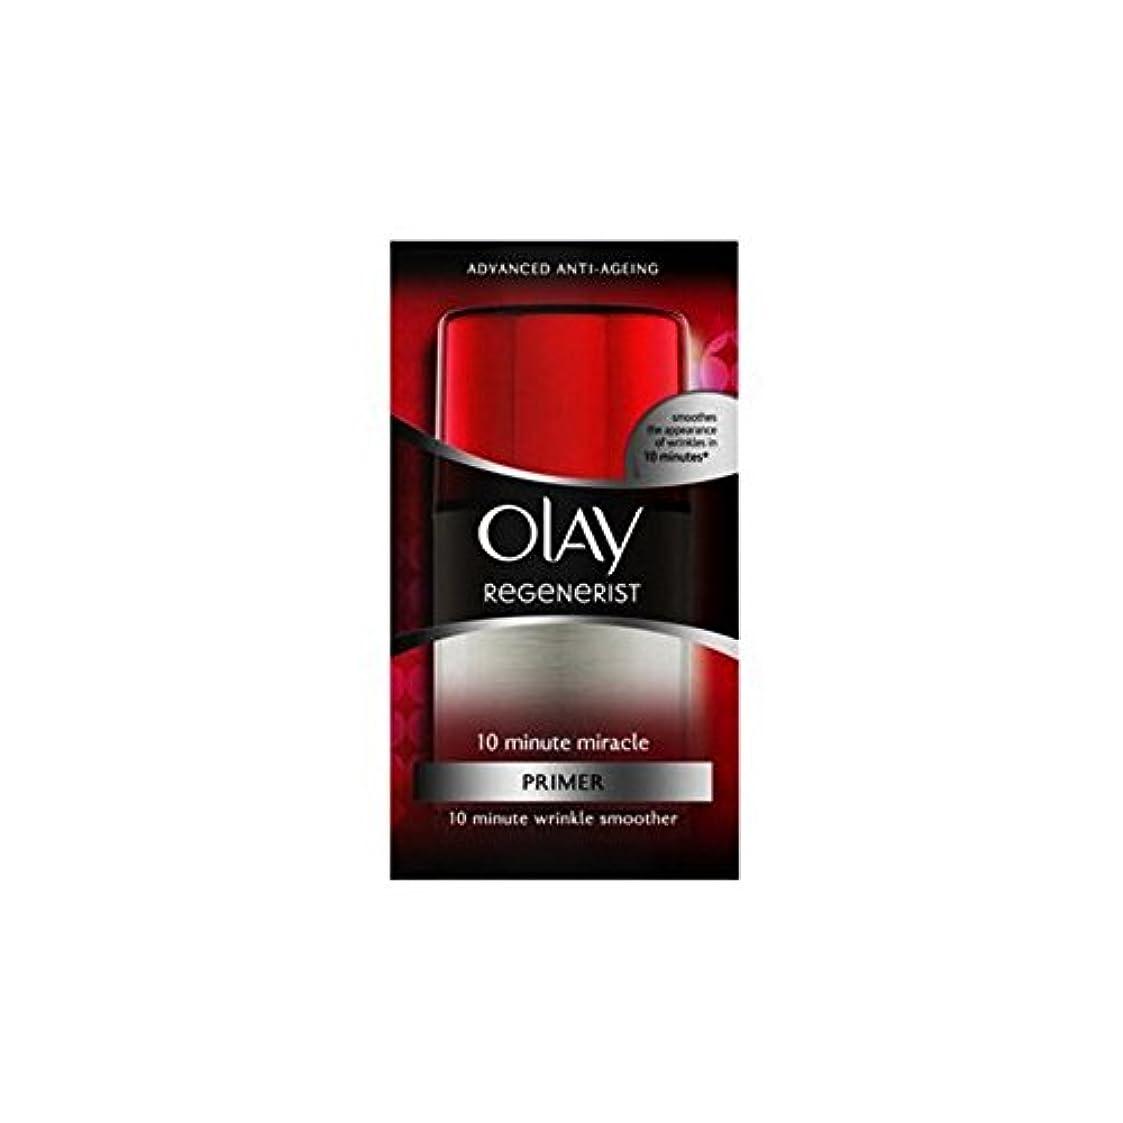 Olay Regenerist Super 10 Minute Miracle Facial Moisturiser (50ml) - オーレイリジェネスーパー10分の奇跡顔の保湿剤(50ミリリットル) [並行輸入品]